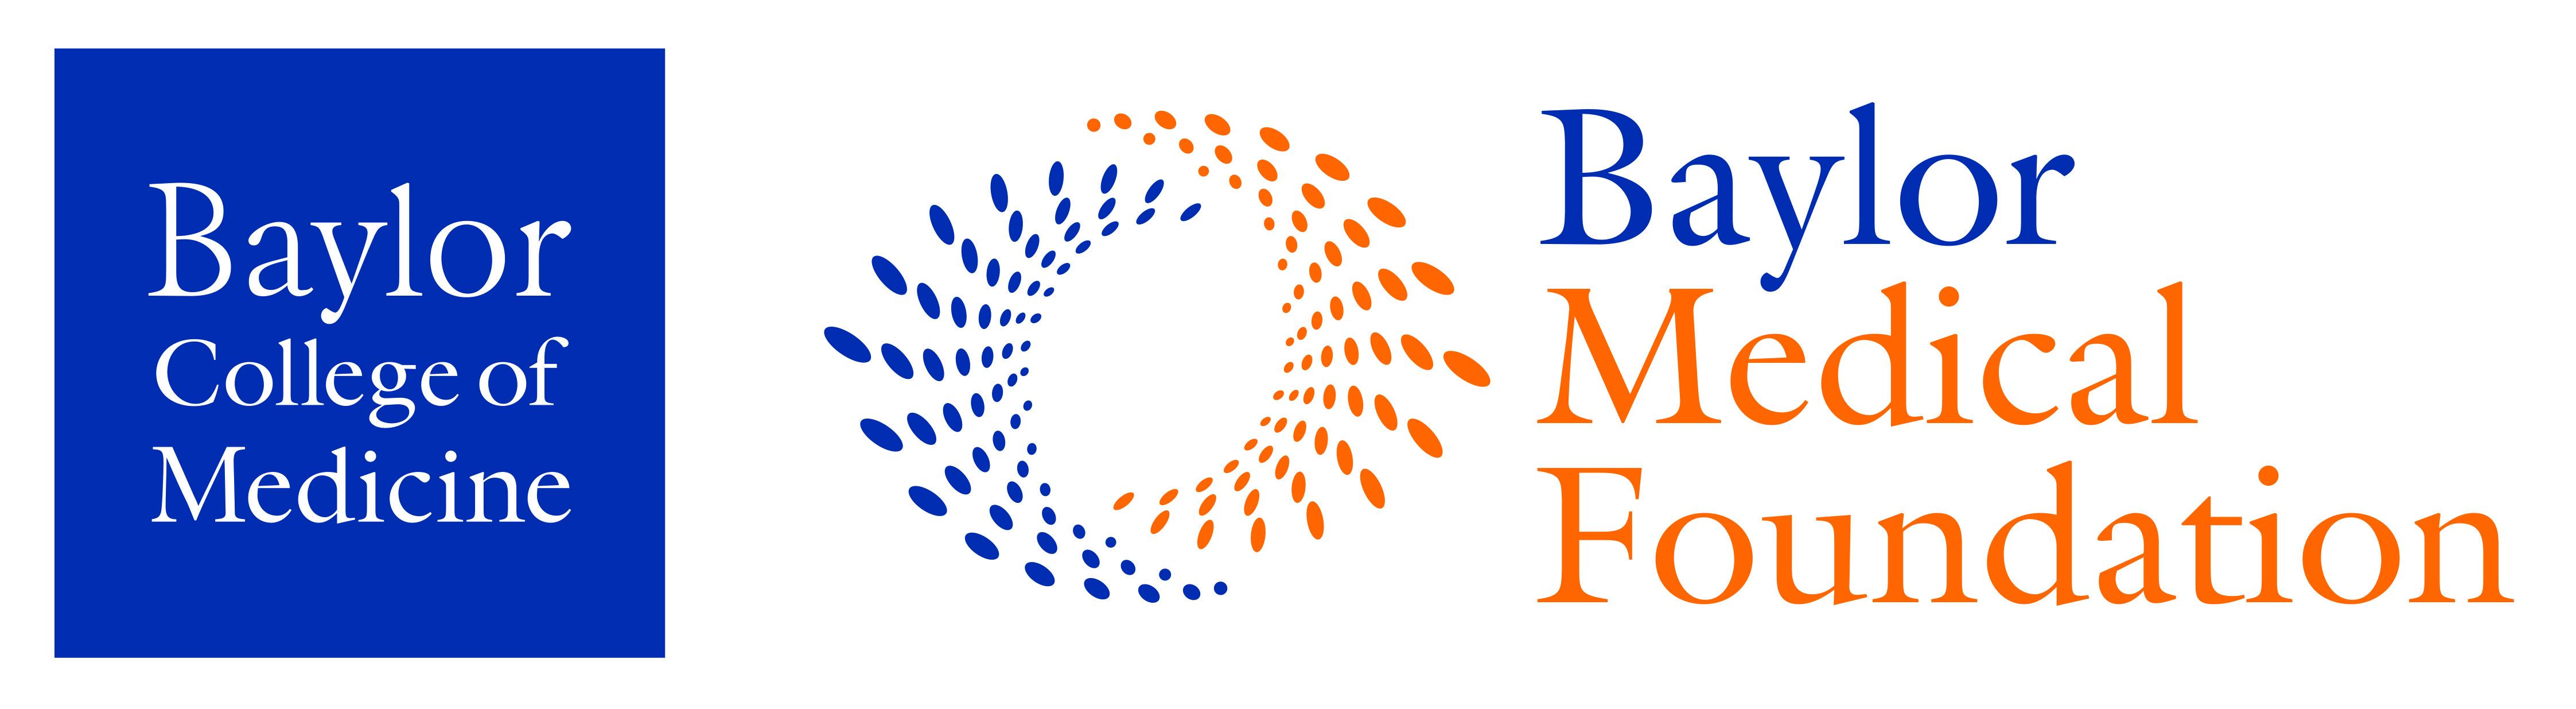 BCM-BMF logos horiz